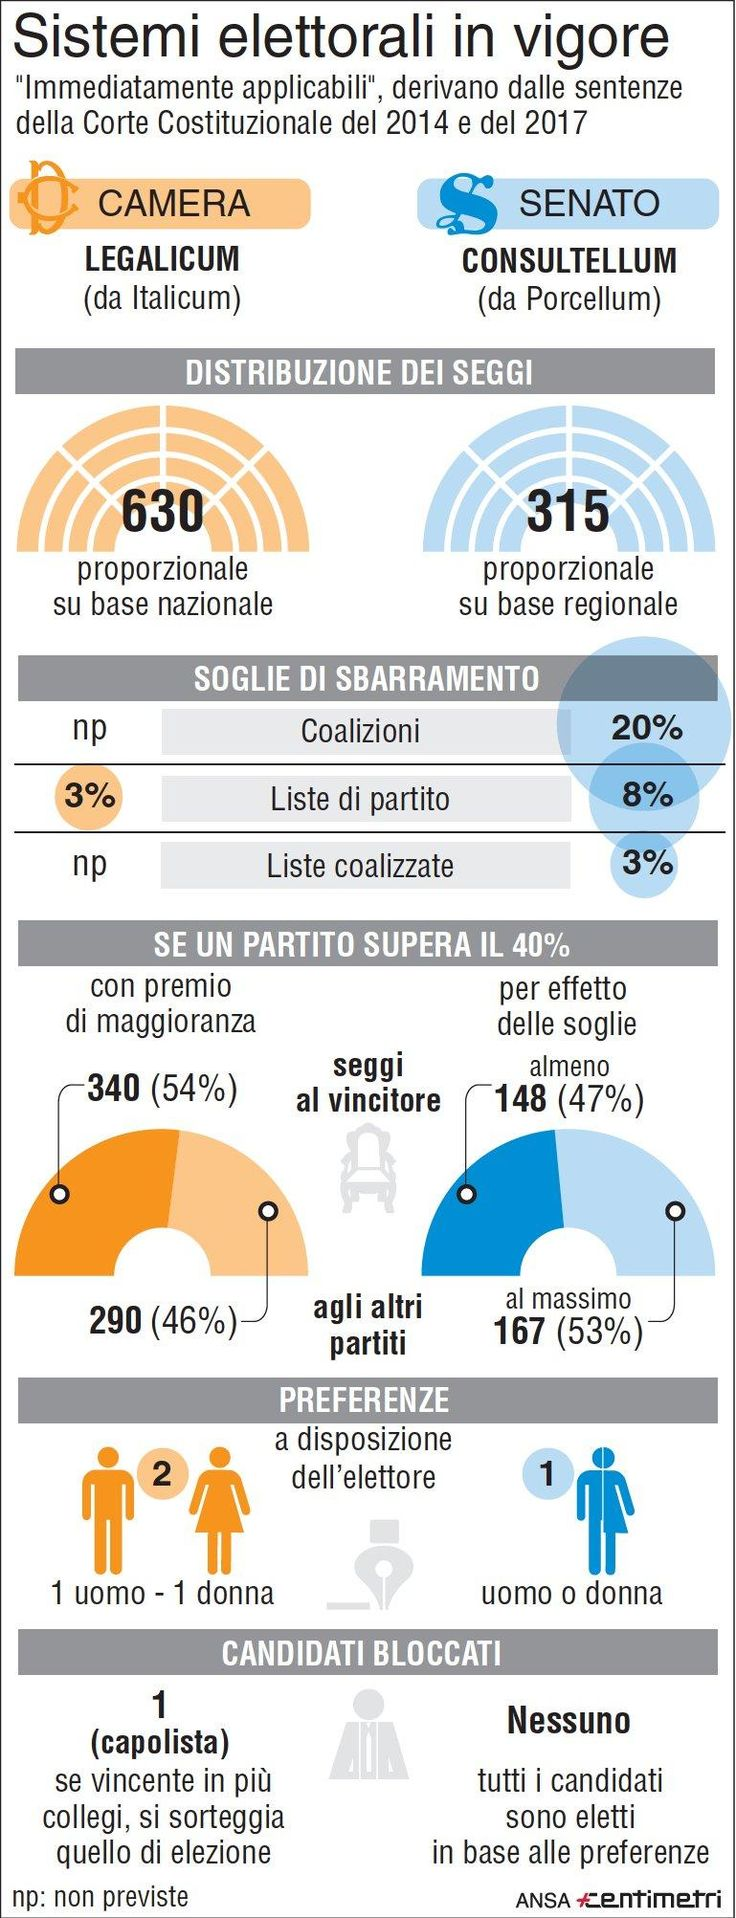 Legge elettorale, i sistemi in vigore